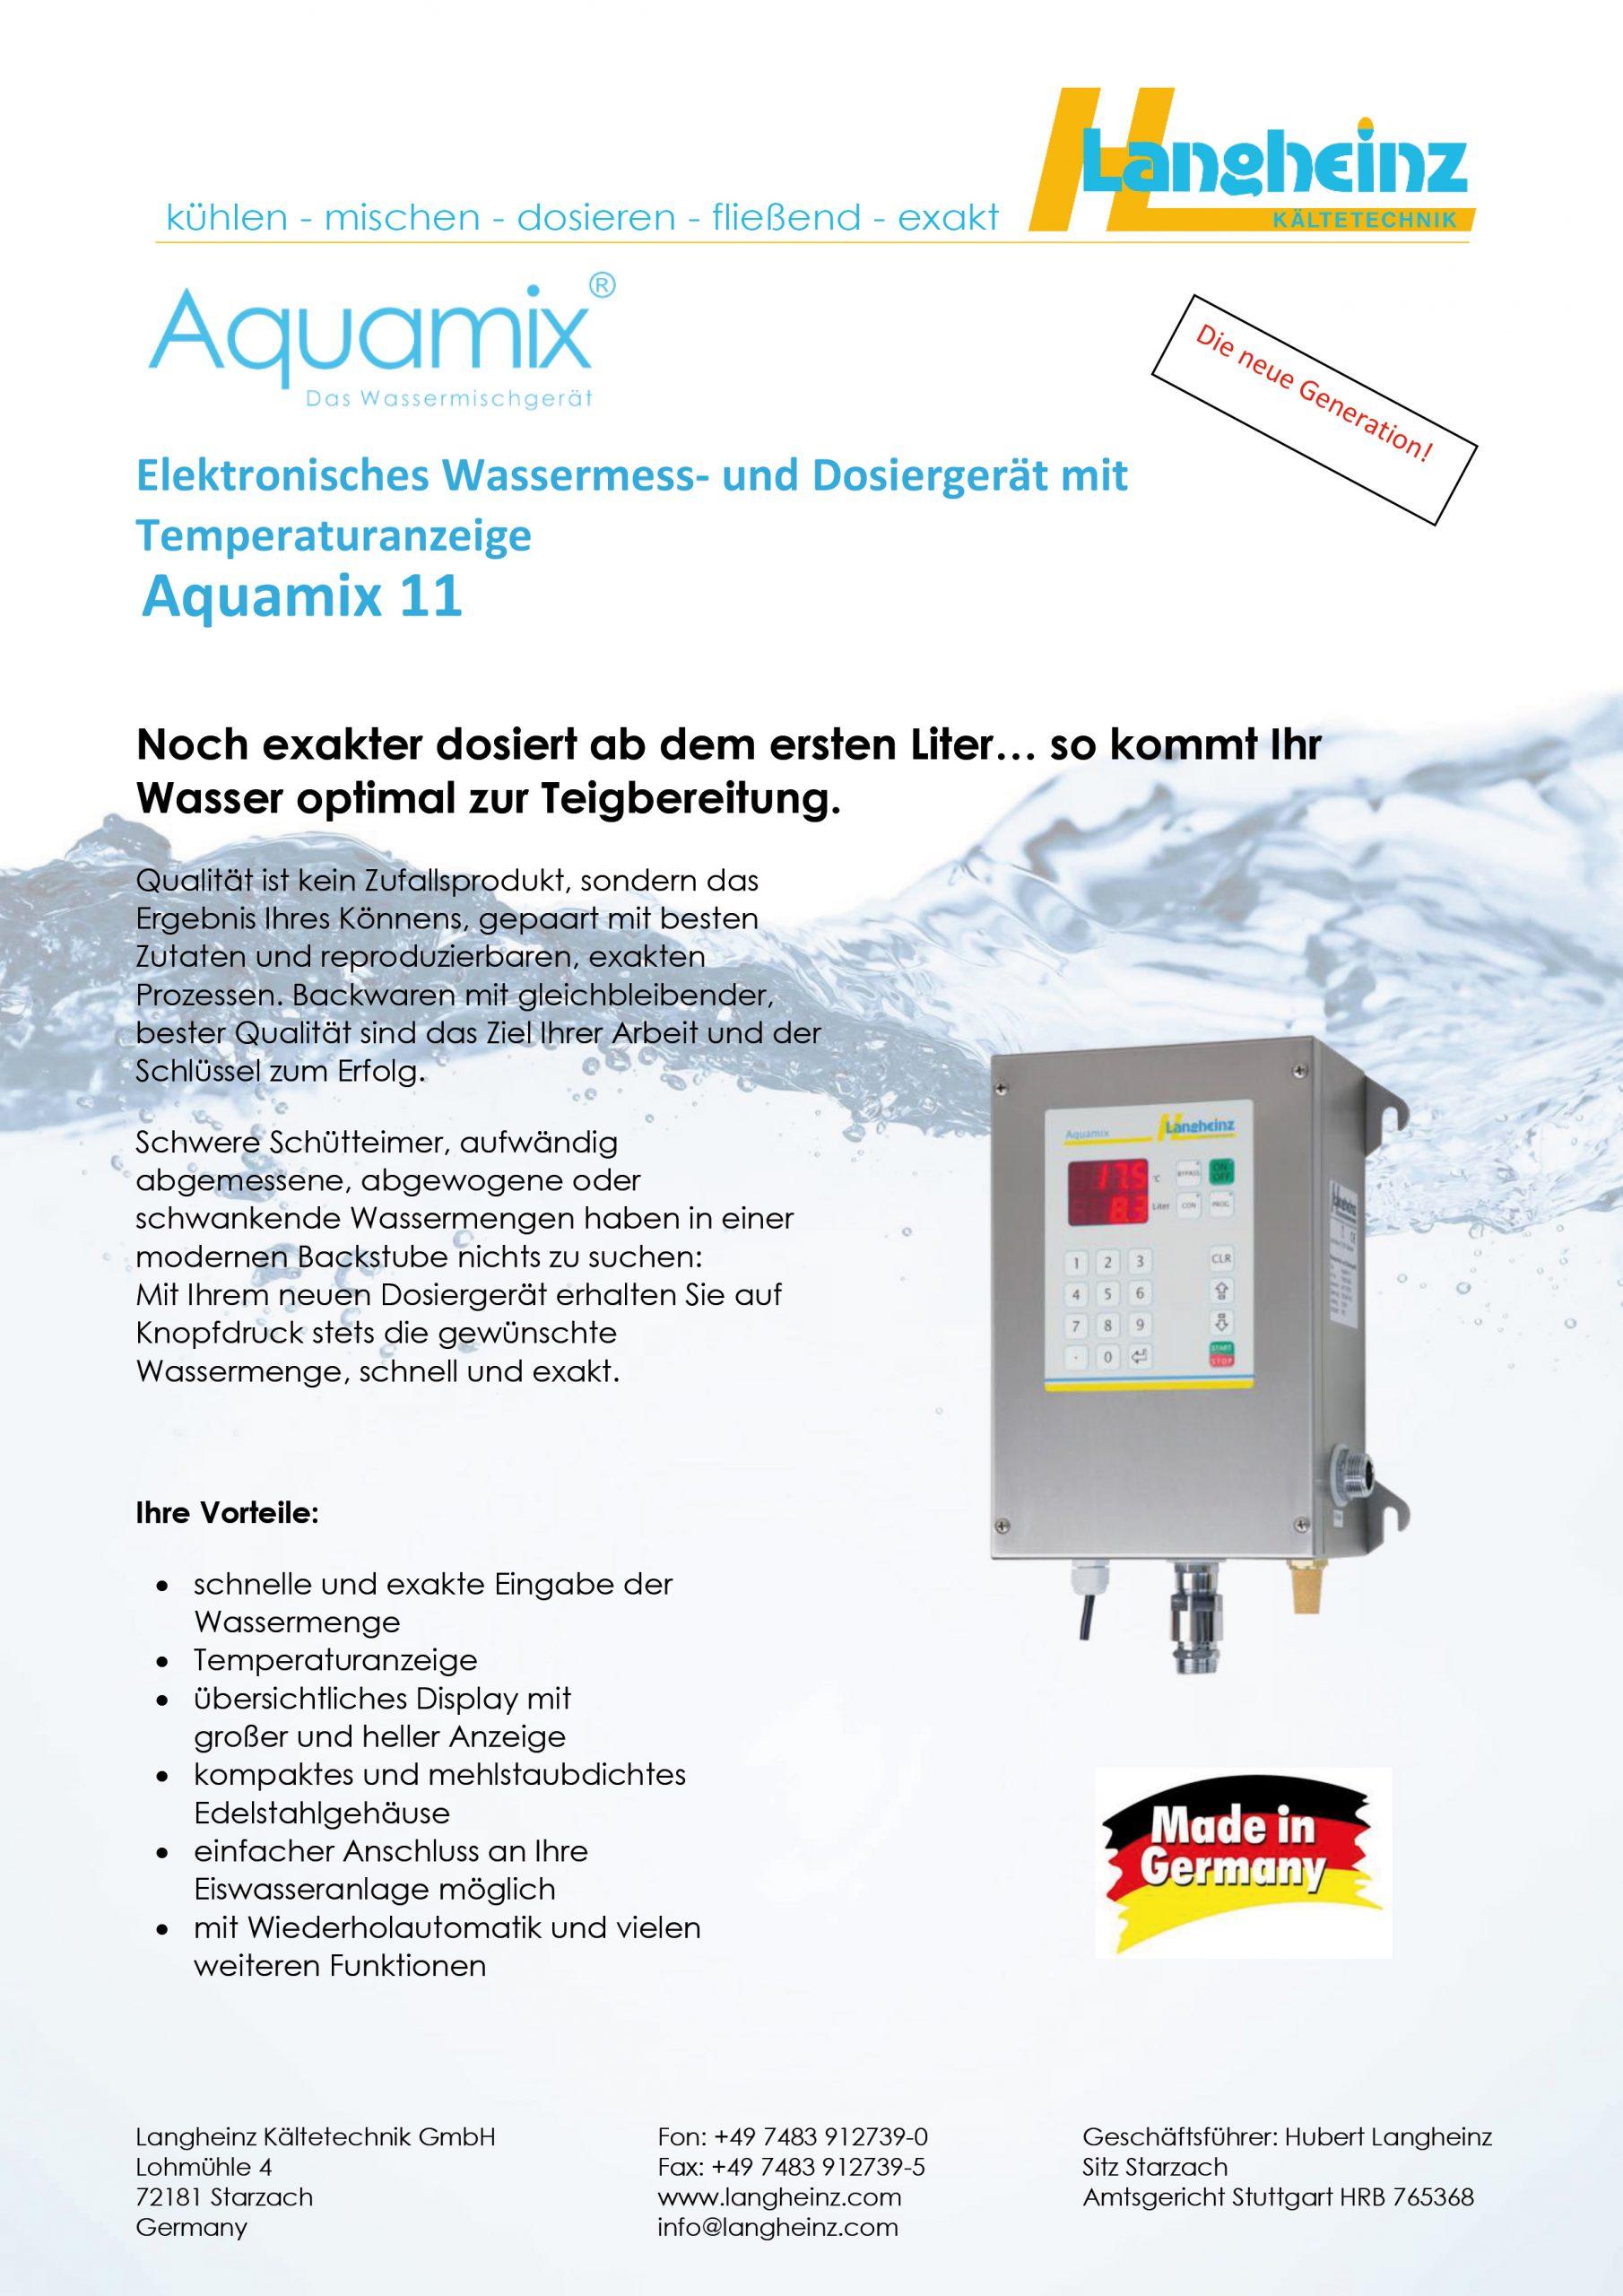 Datenblatt Aquamix 11 (Preview)